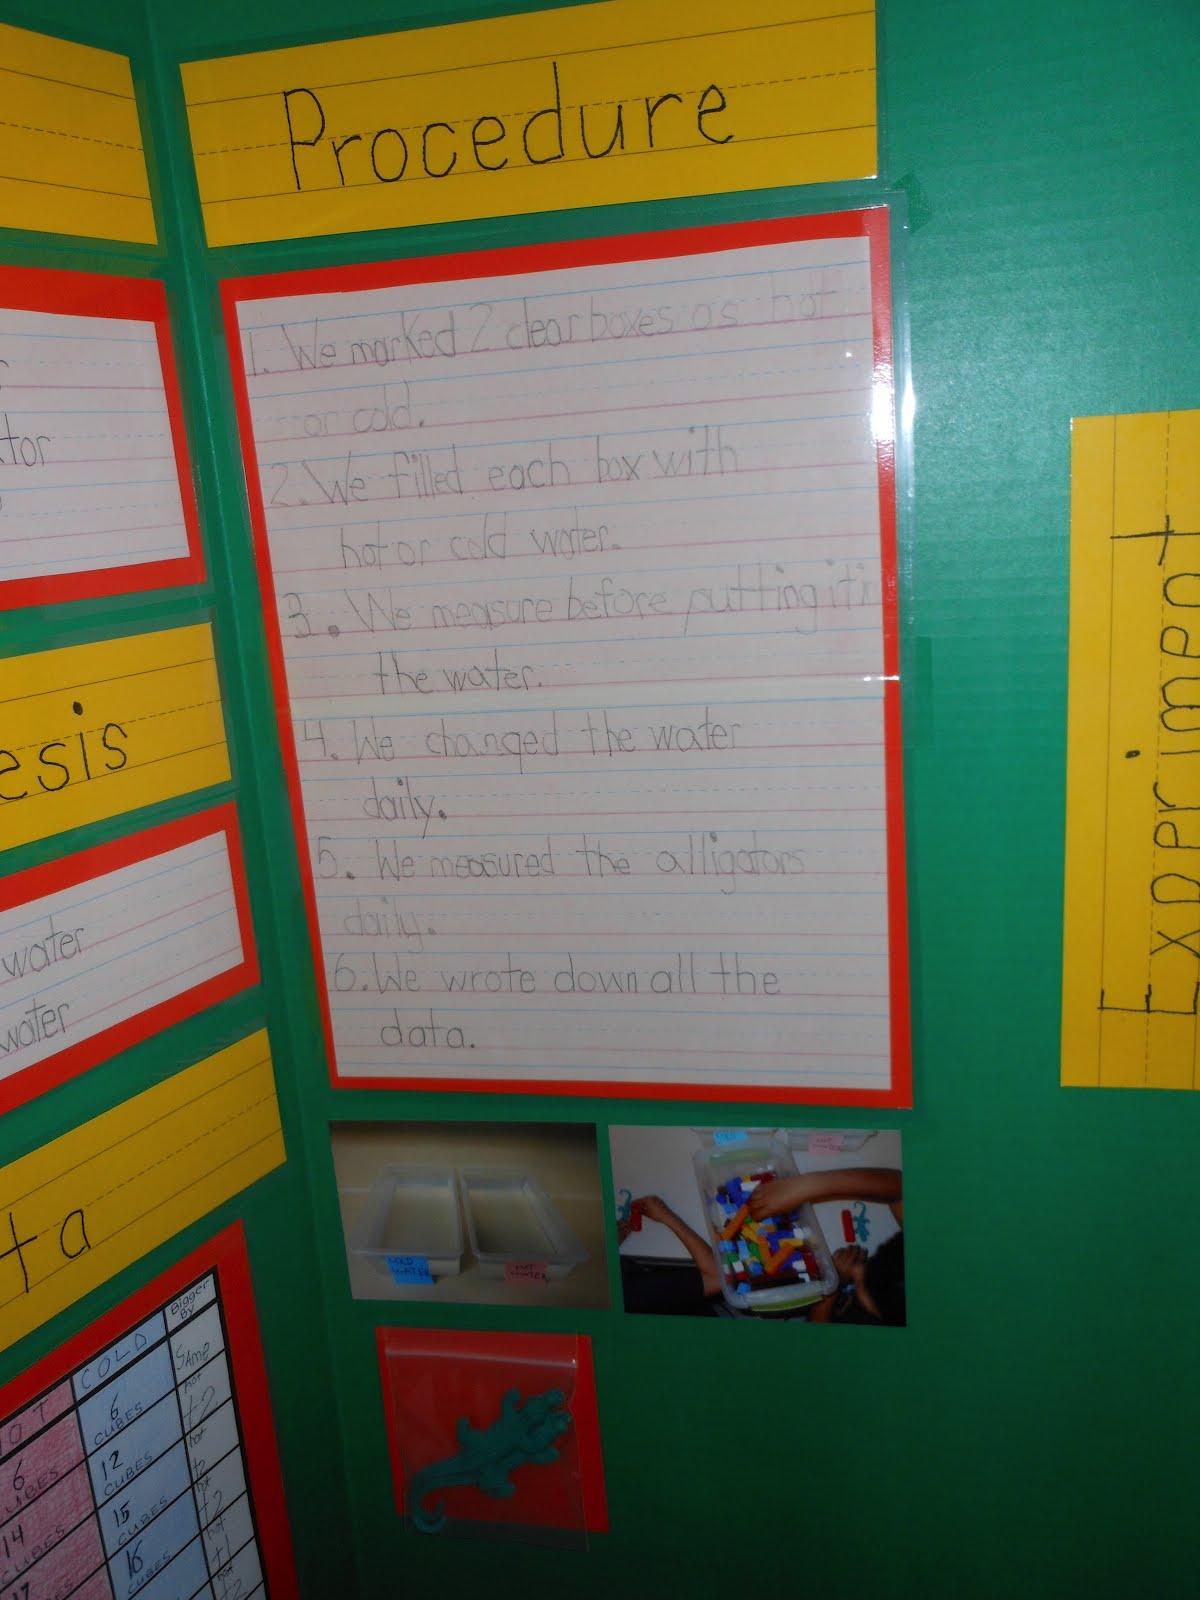 DSCN1682 1 - Kindergarten Science Fair Project